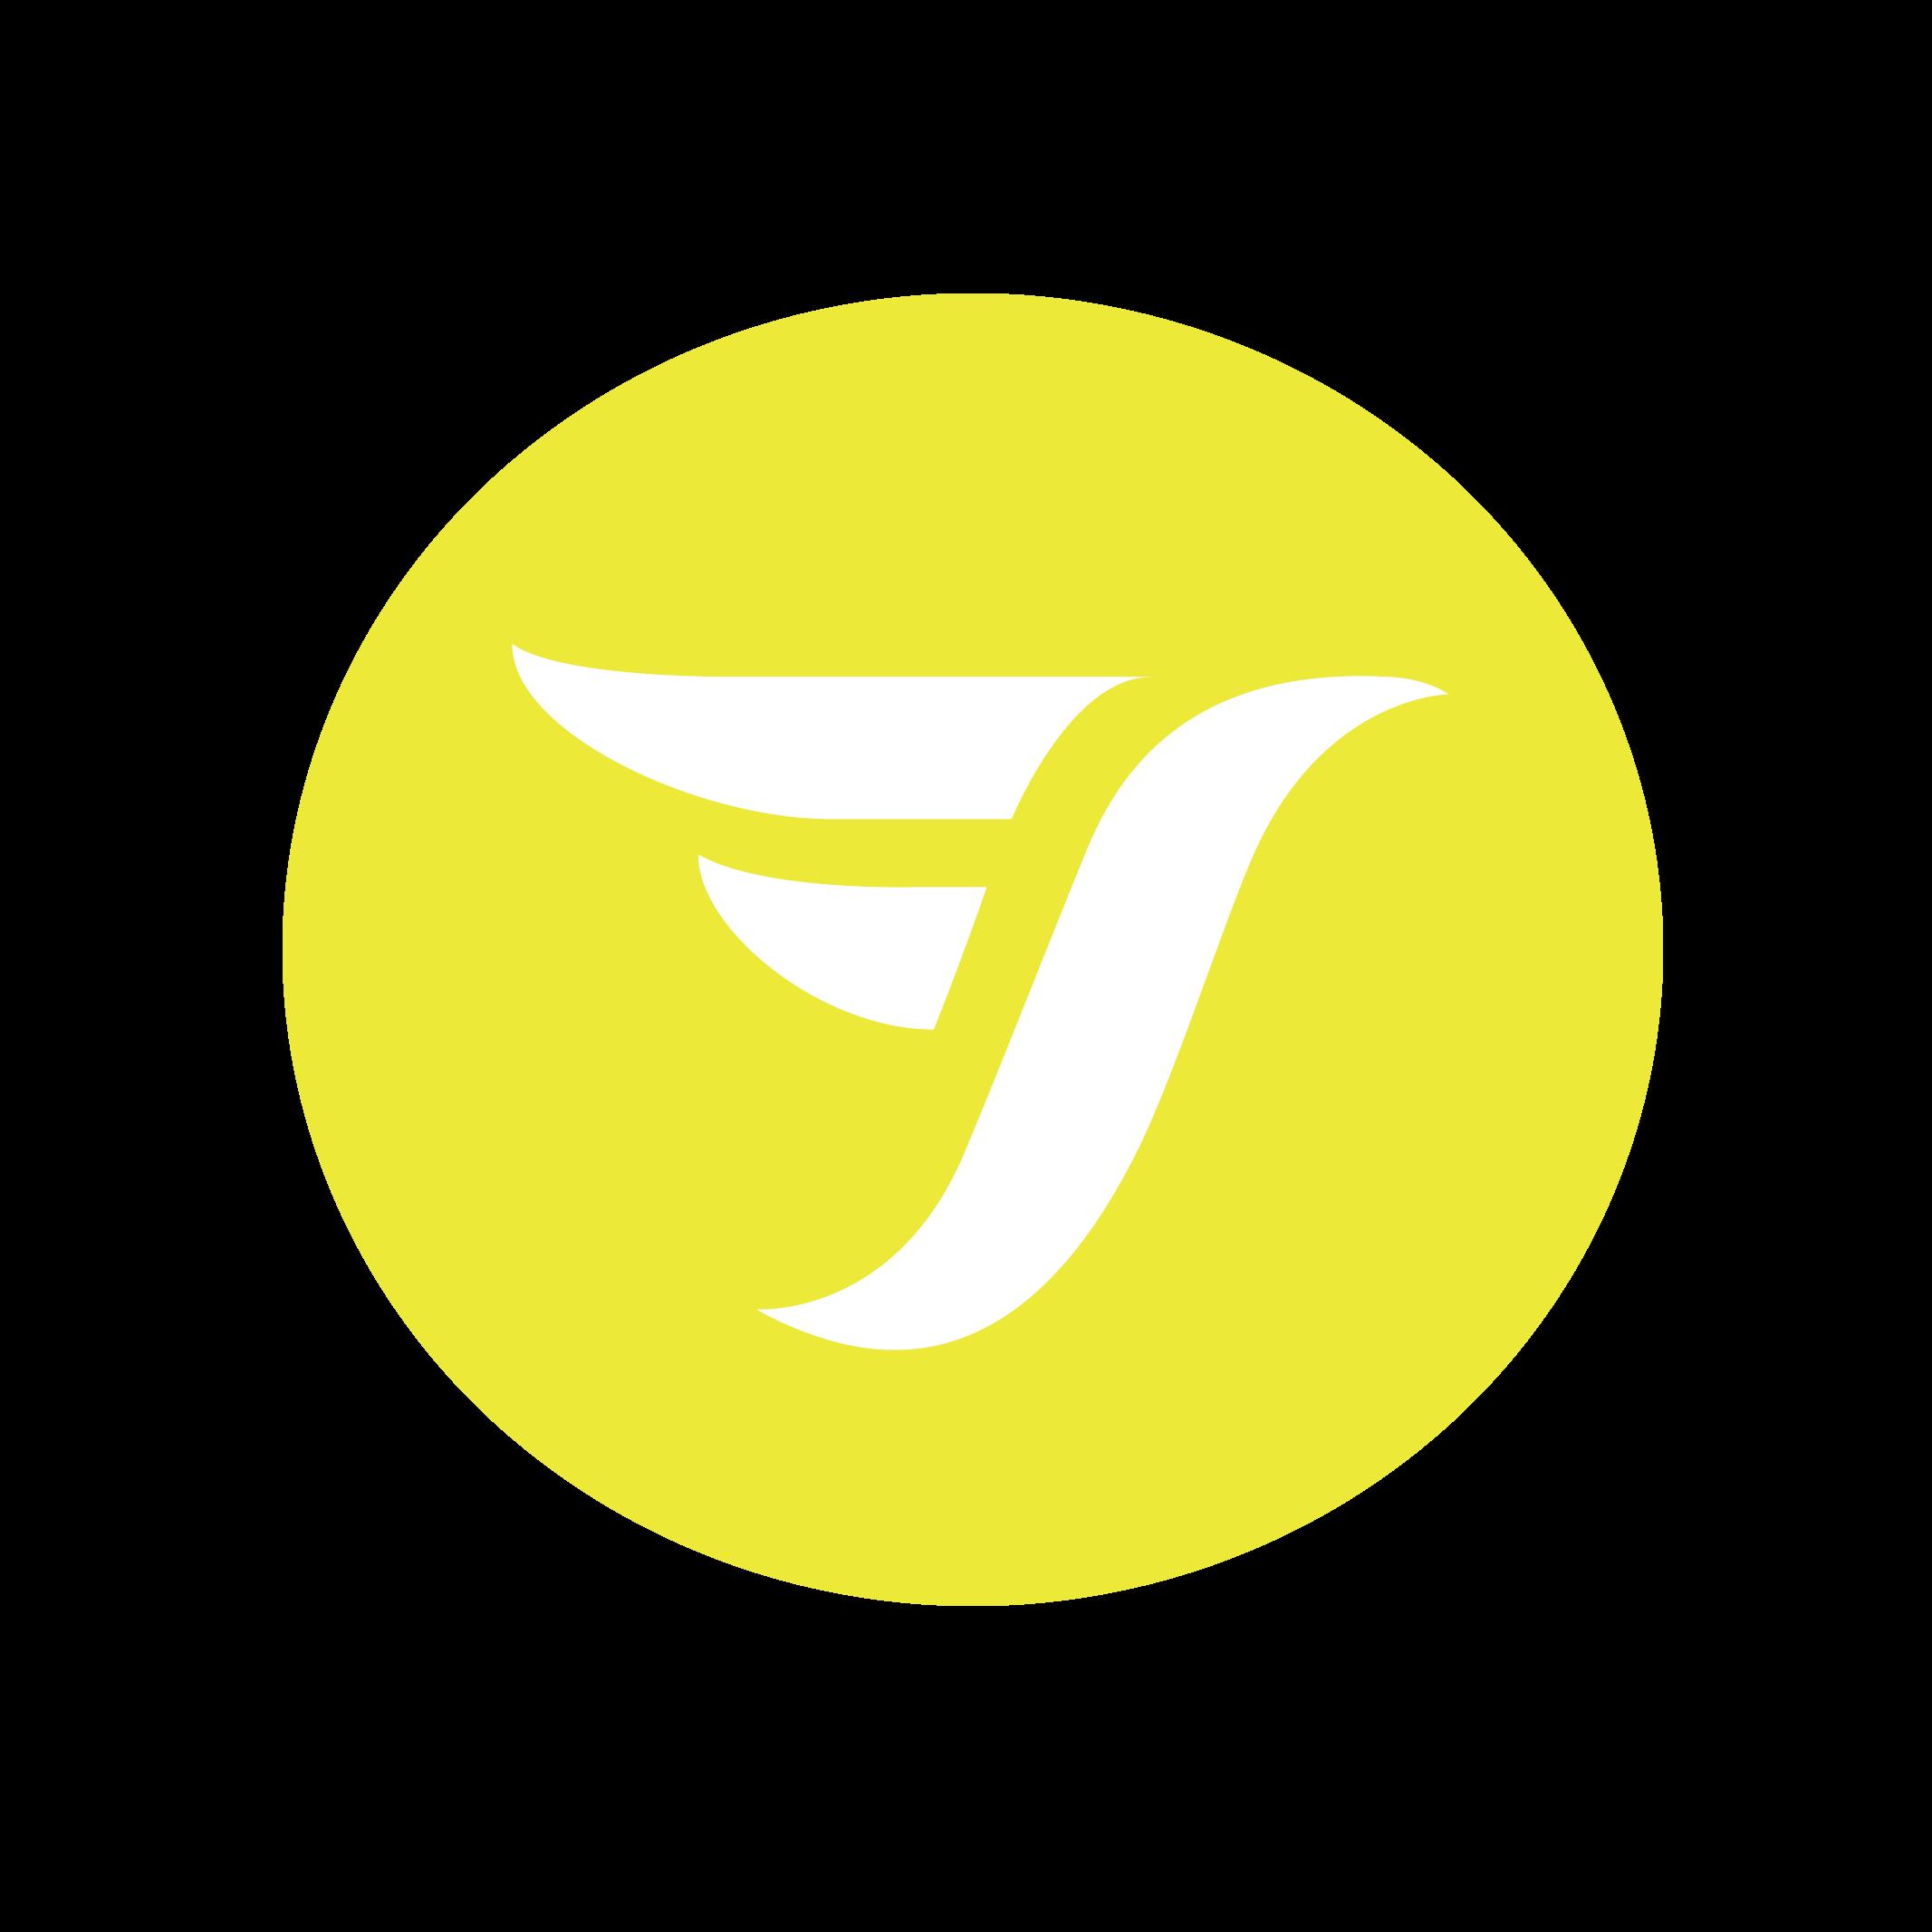 goldpass_symbol.png